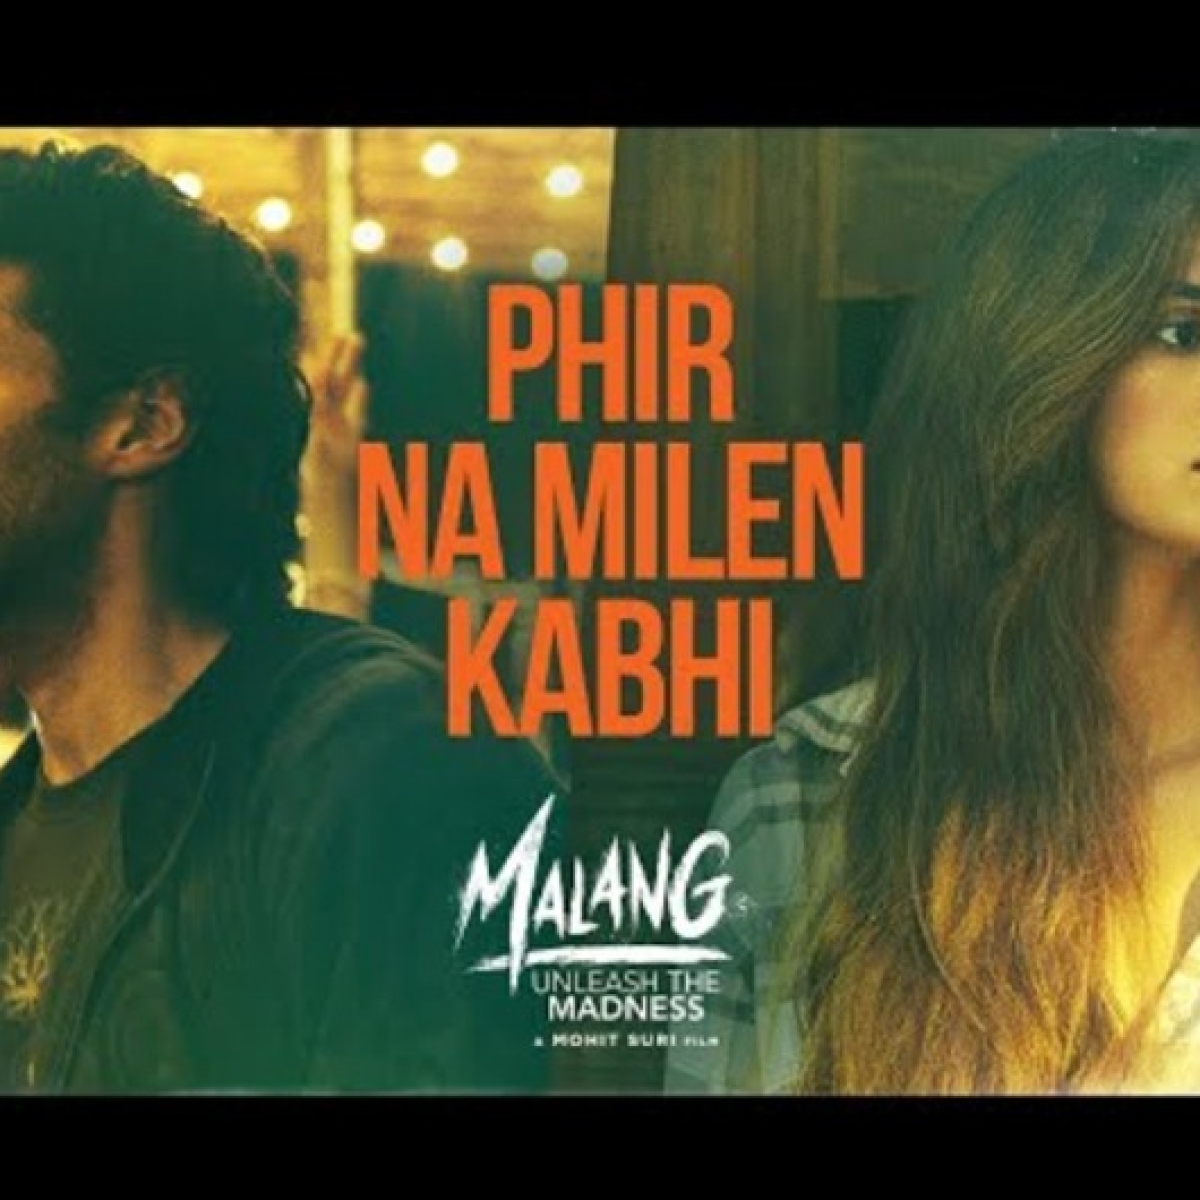 Makers release soulful song 'Phir Na Milen Kabhi' from 'Malang'